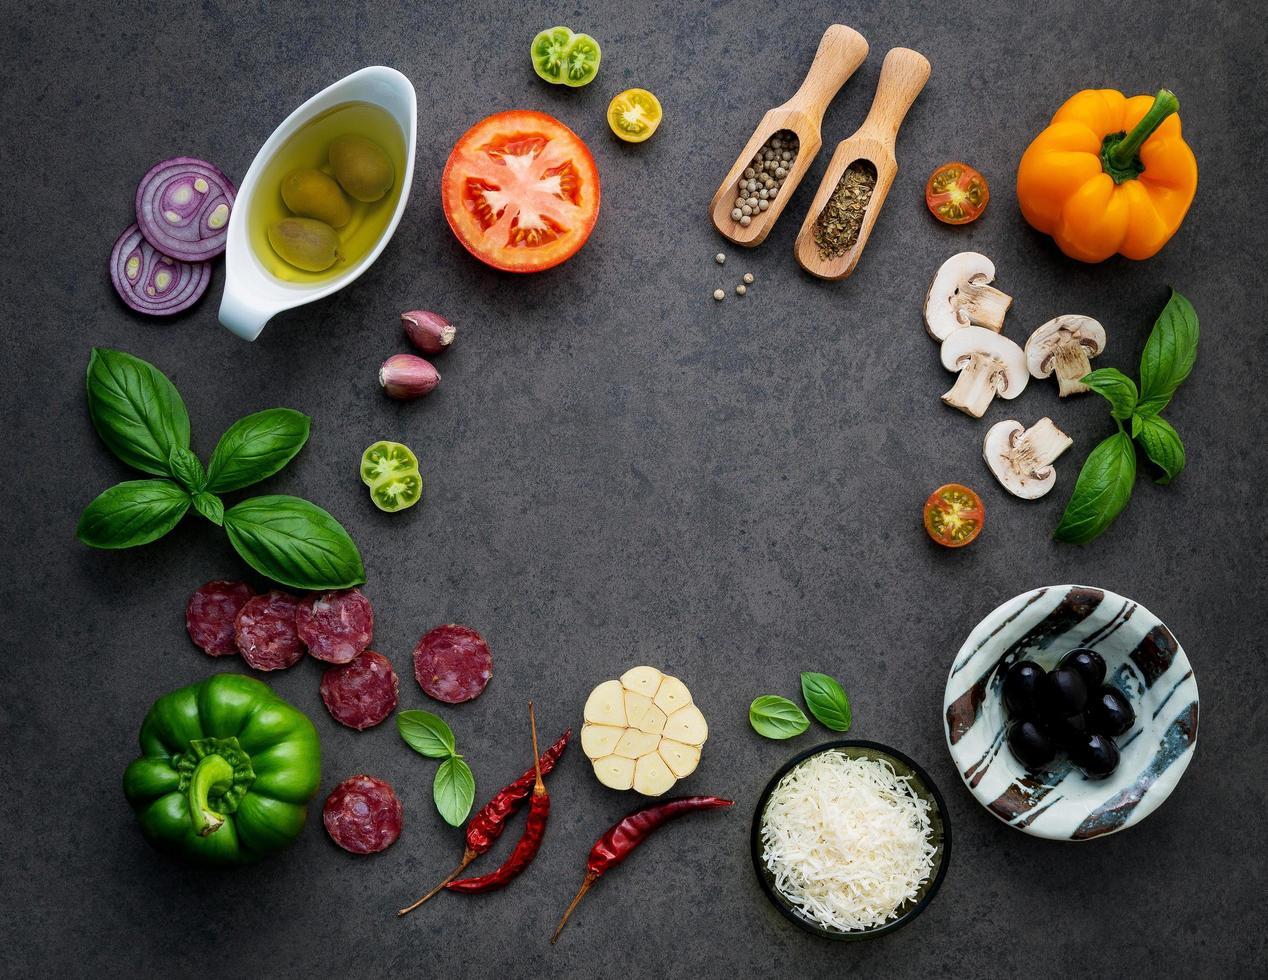 pizza-ingrediënten op leisteen foto